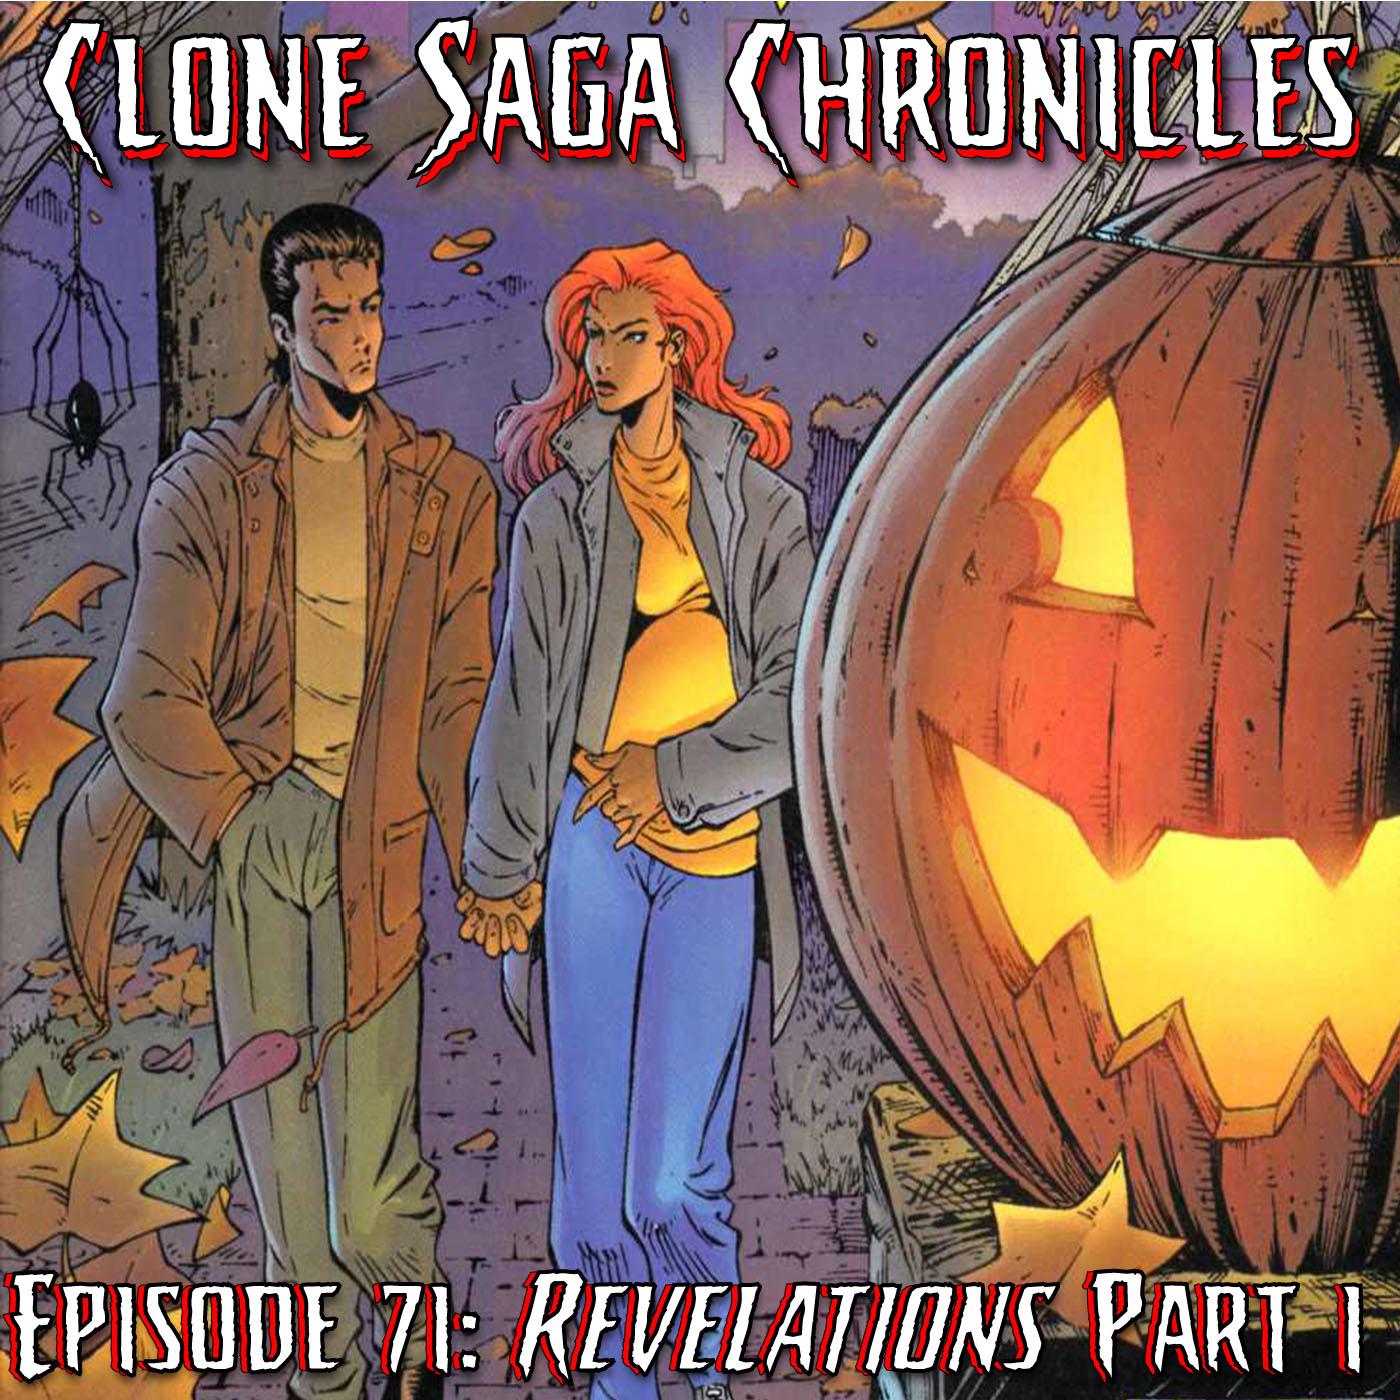 CSC Episode 71: Revelations… Part One-Three